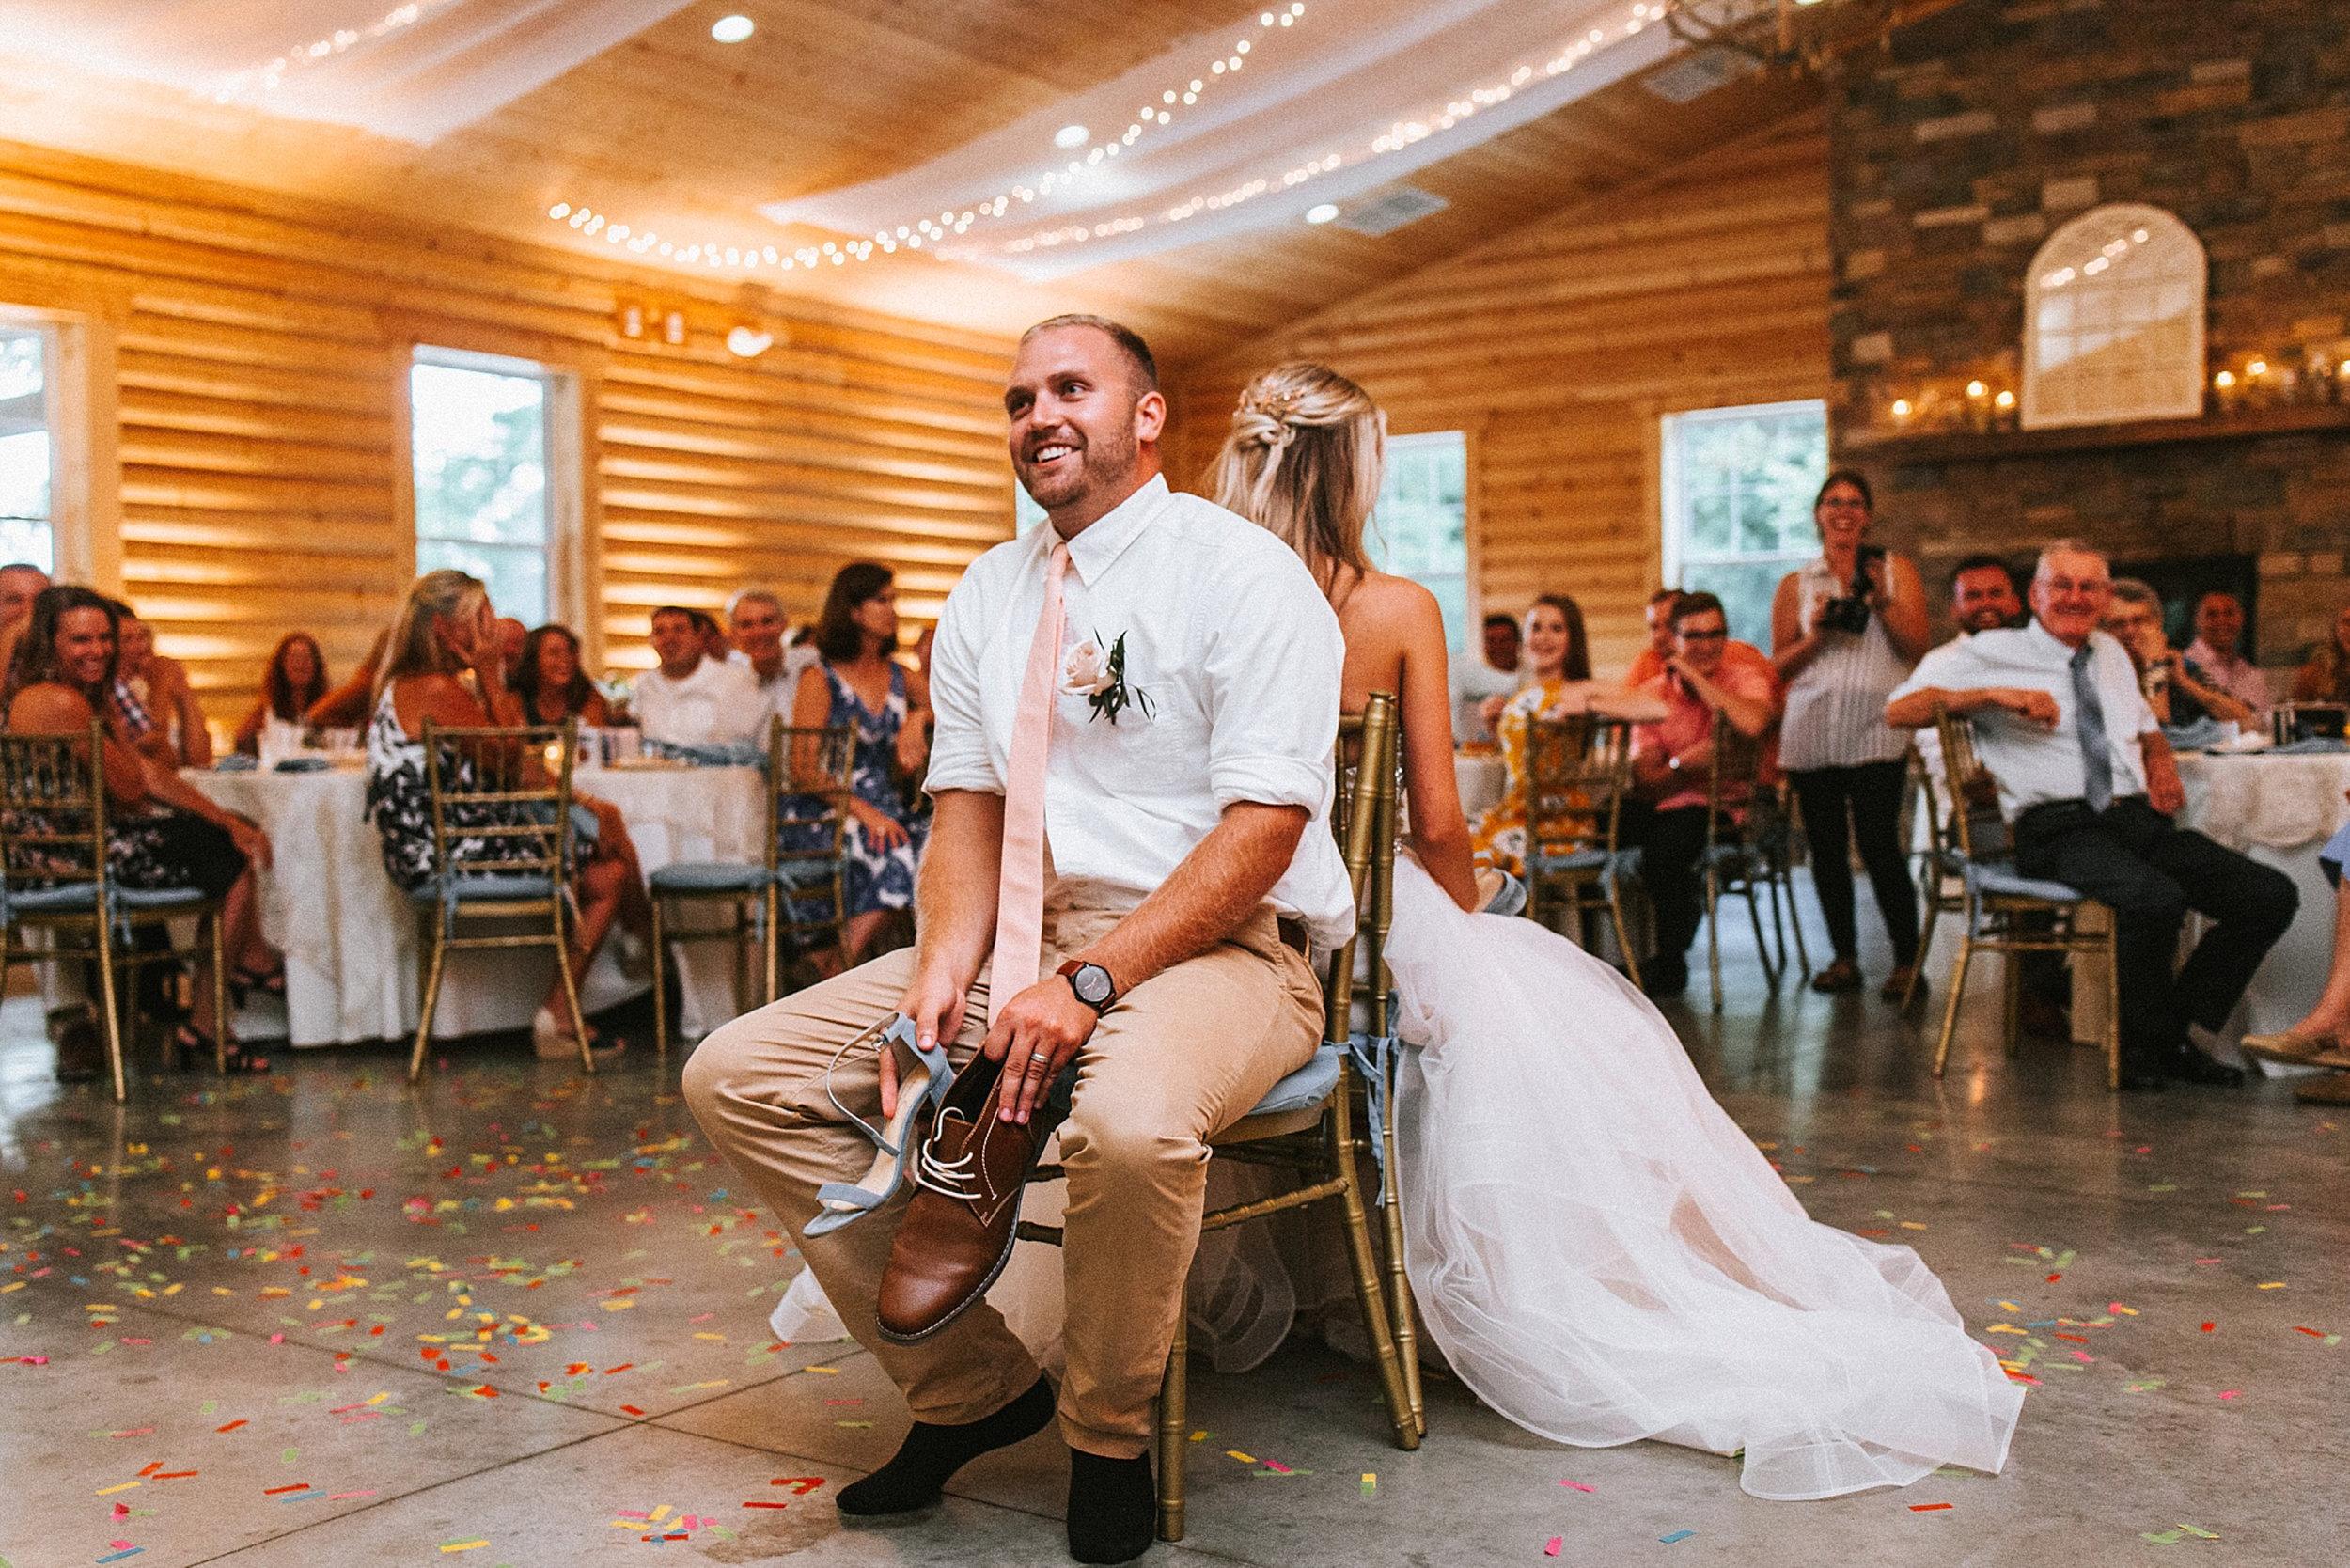 Brooke Townsend Photography - Cincinnati Wedding Photographer (147 of 153).jpg